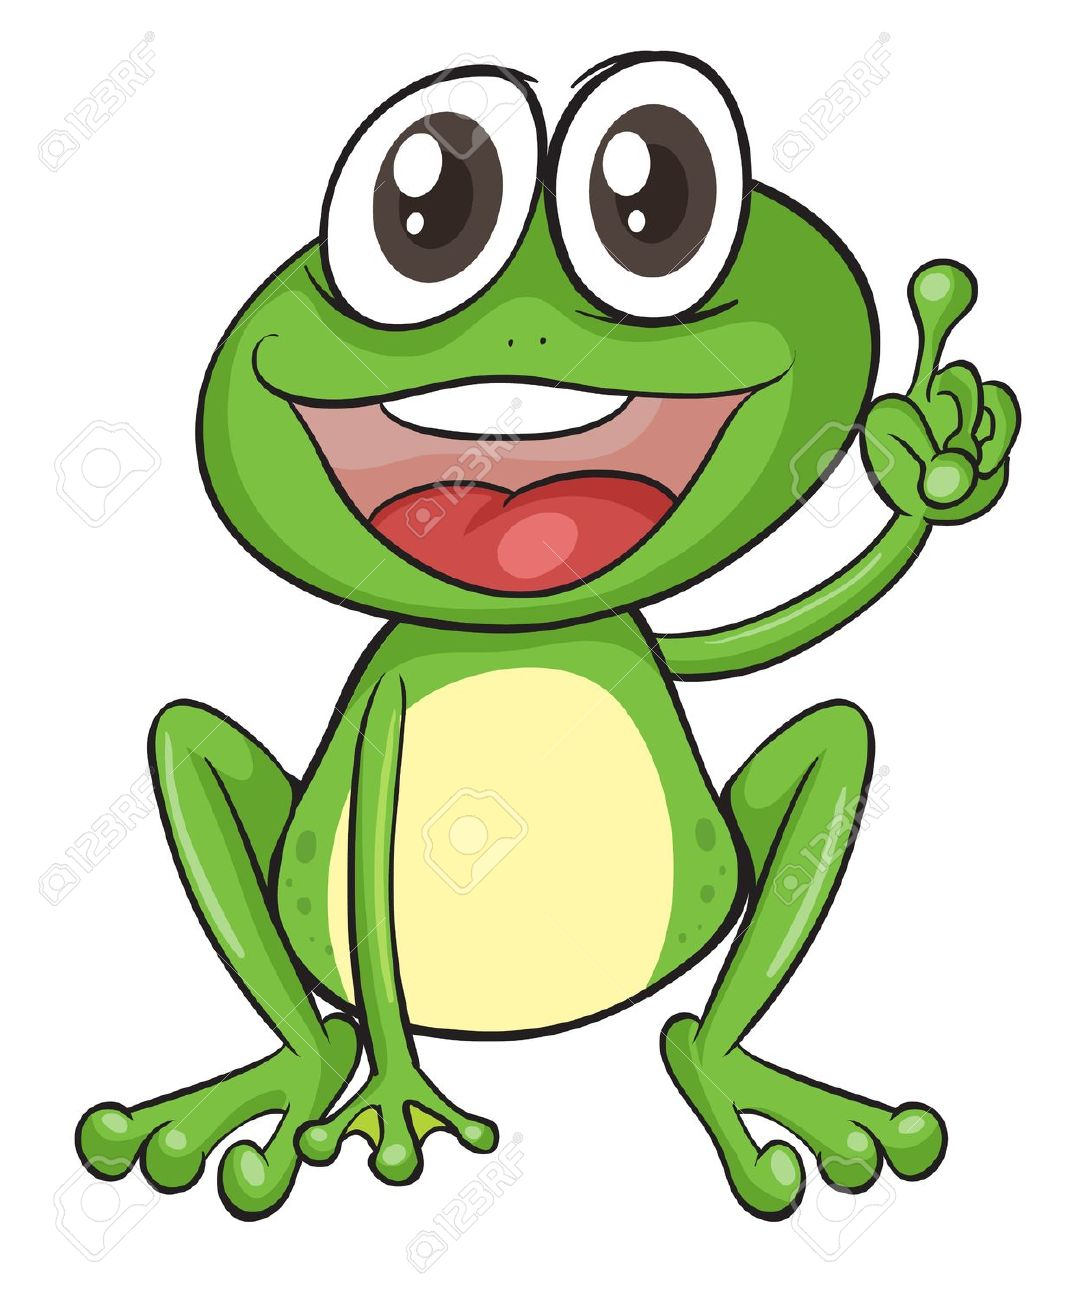 Frog clip art gallery .